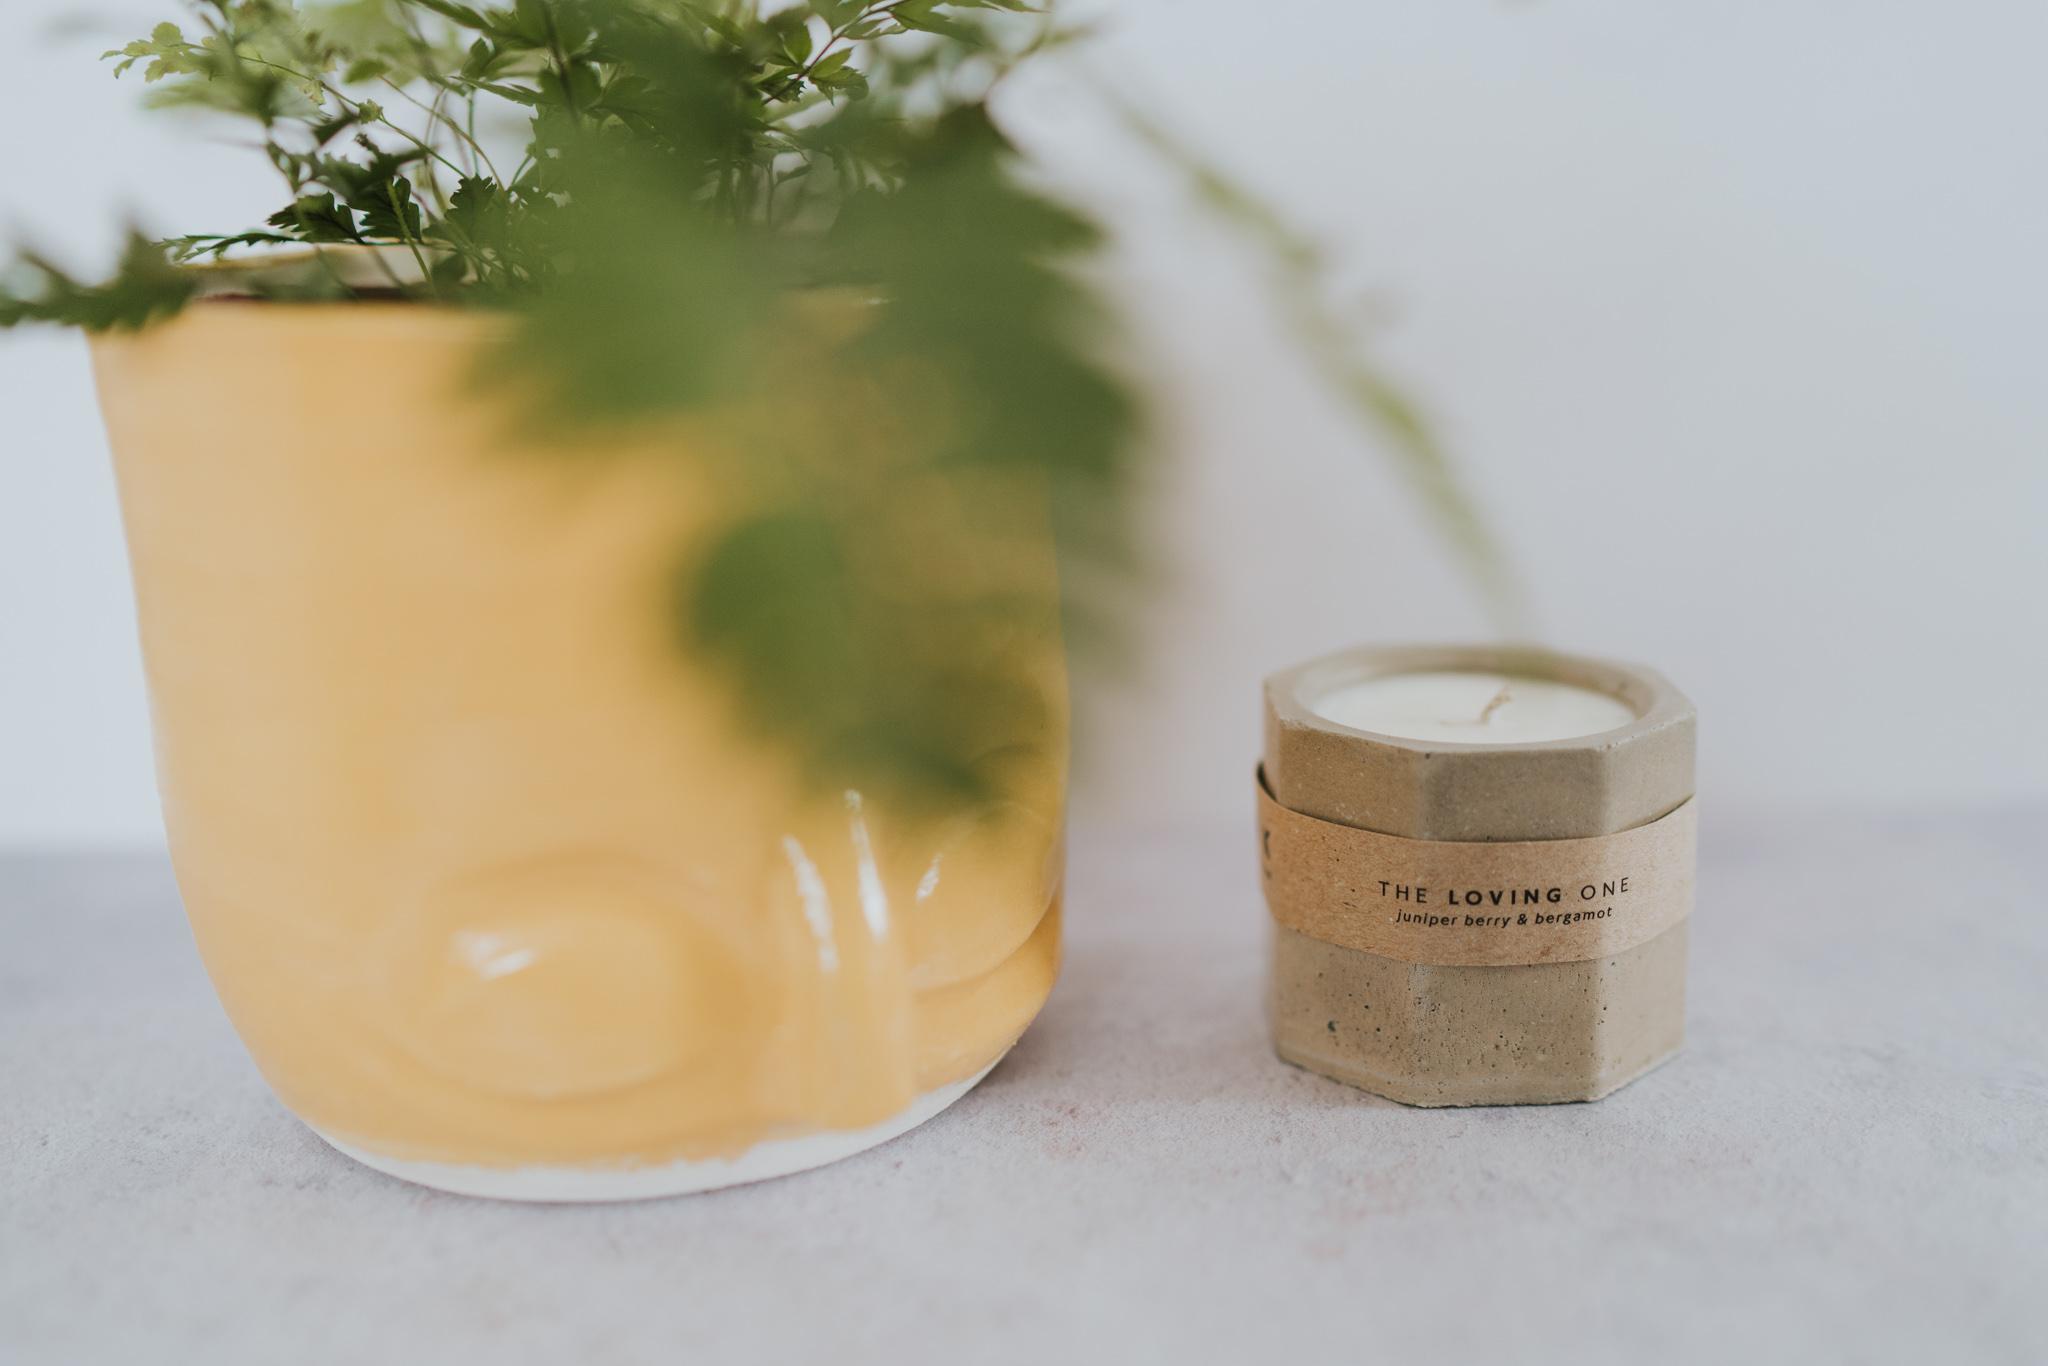 business-branding-panpank-candles-grace-elizabeth-colchester-essex-devon-suffolk-and-norfolk-alternative-wedding-and-family-photographer (5 of 19).jpg